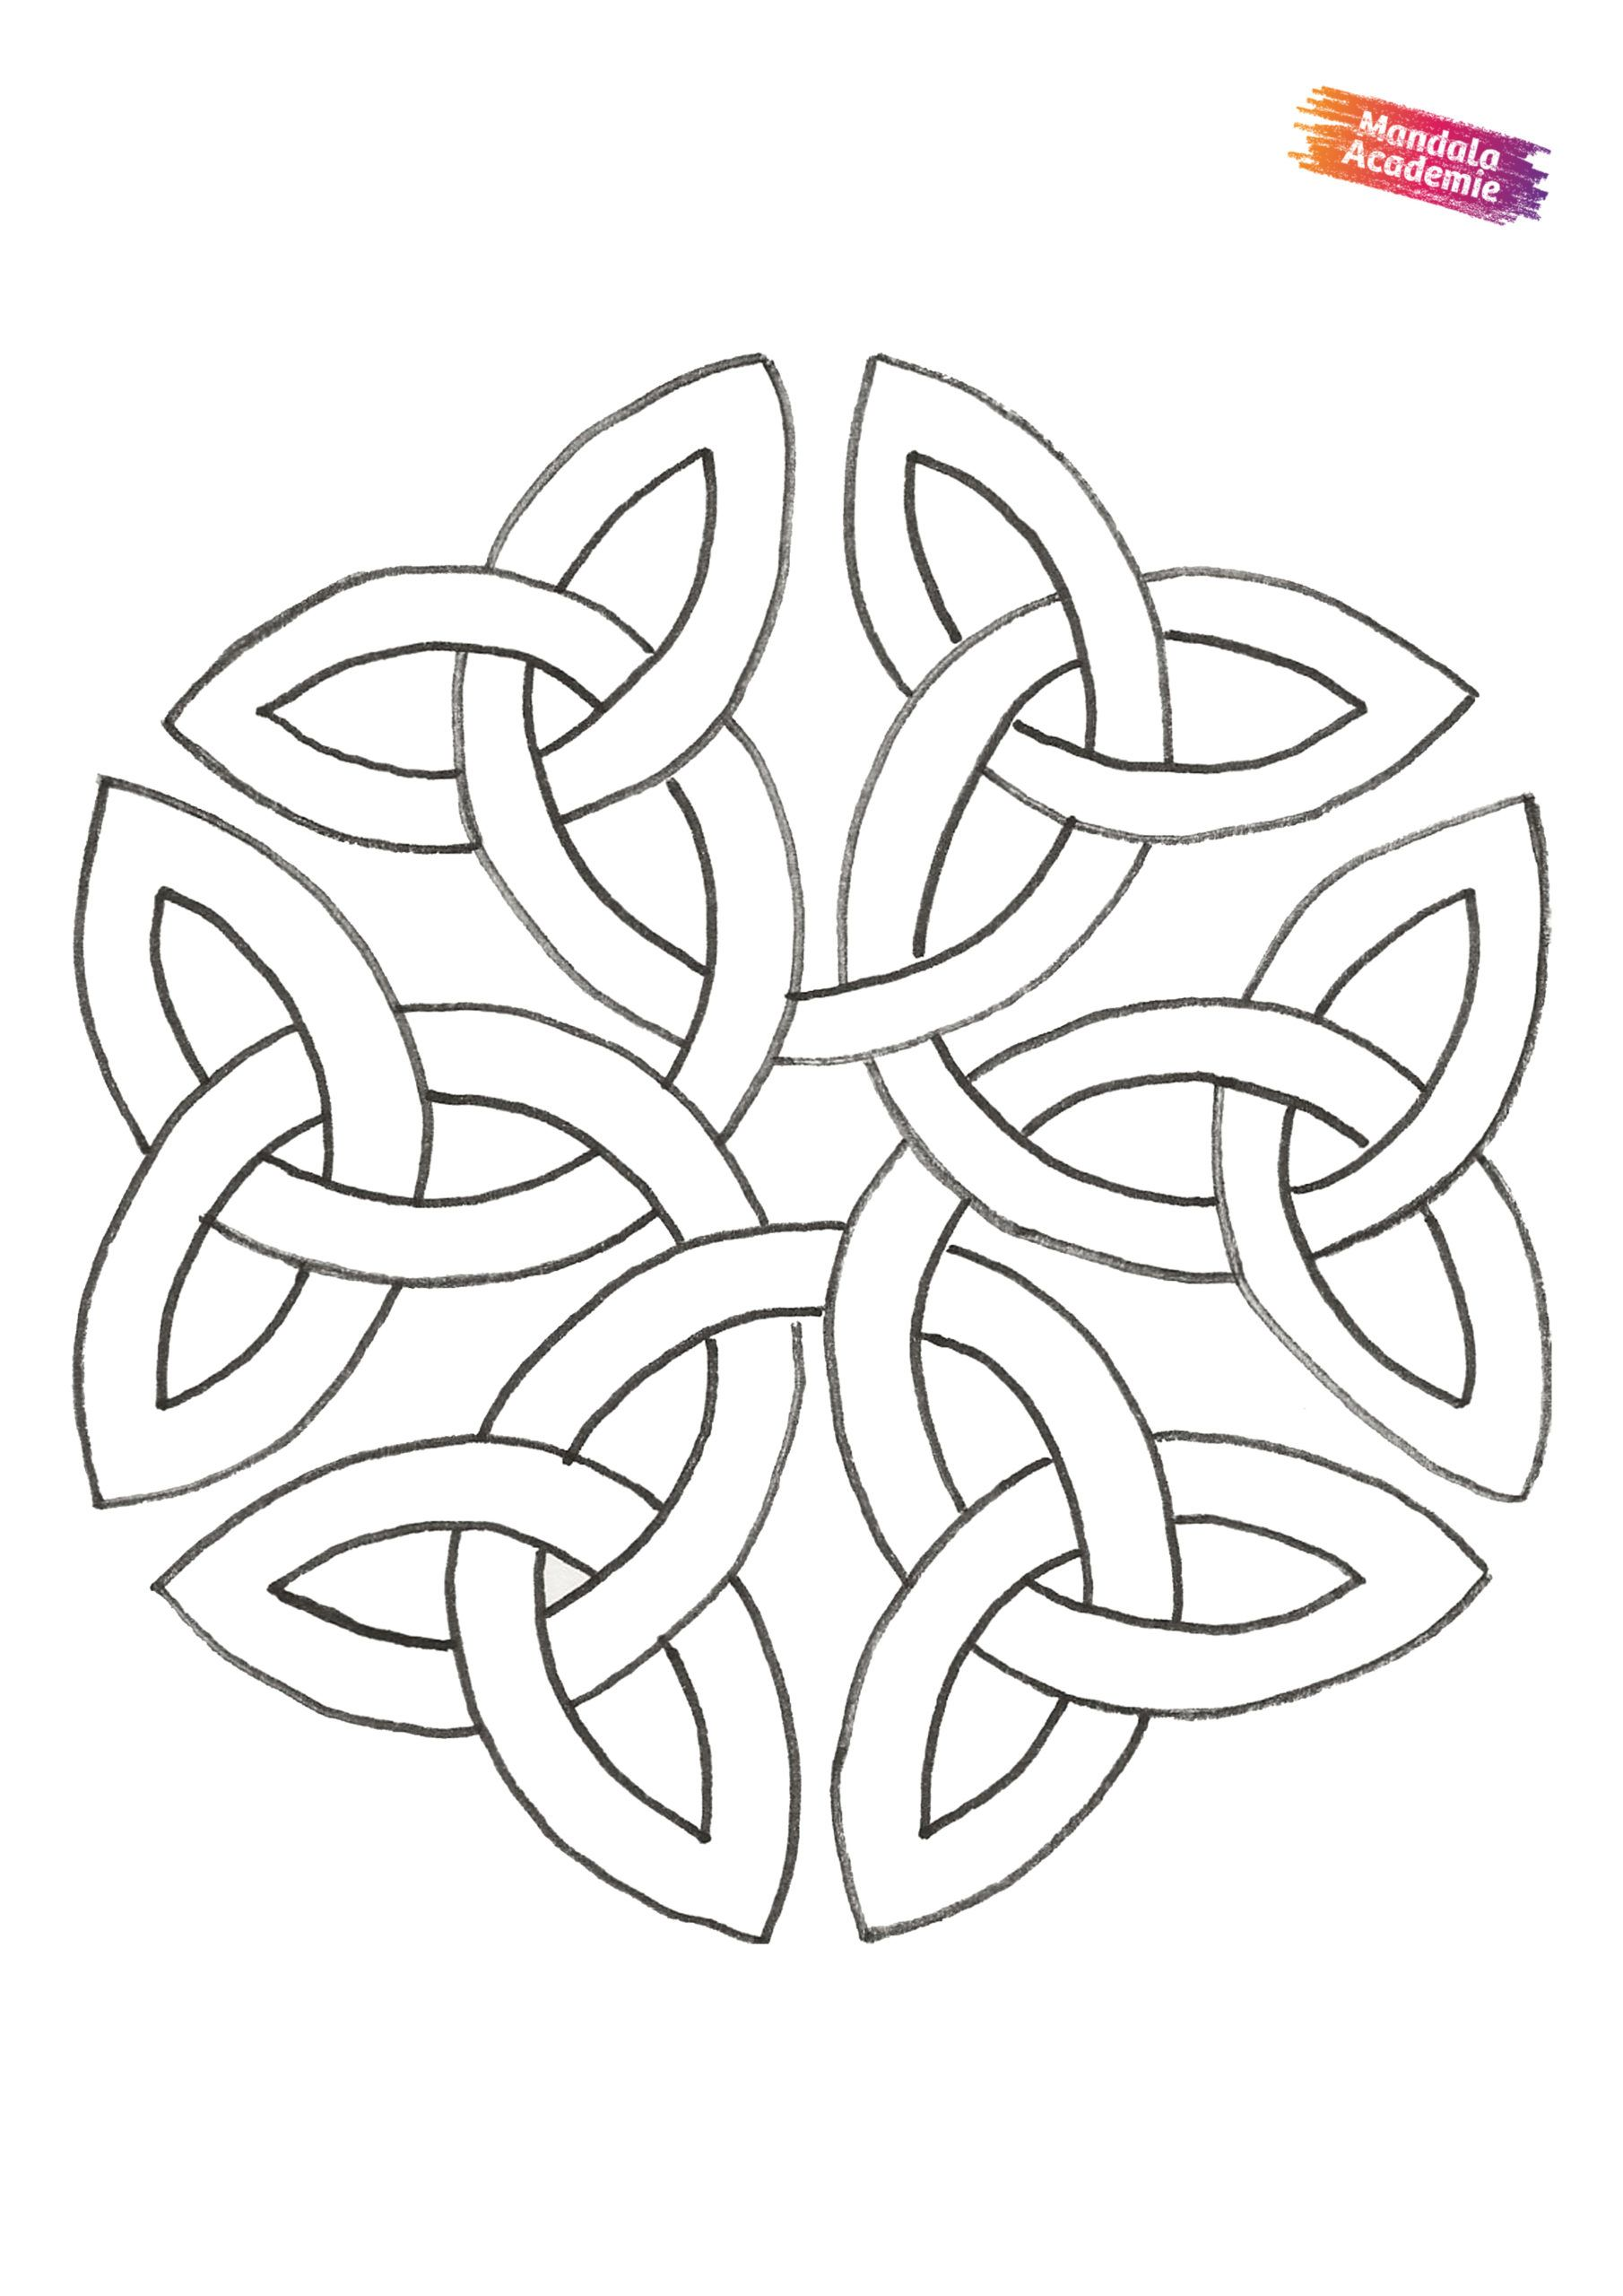 Kleurplaat April 2020 A4 Mandala Kleurplaten Kleurplaten Keltische Symbolen